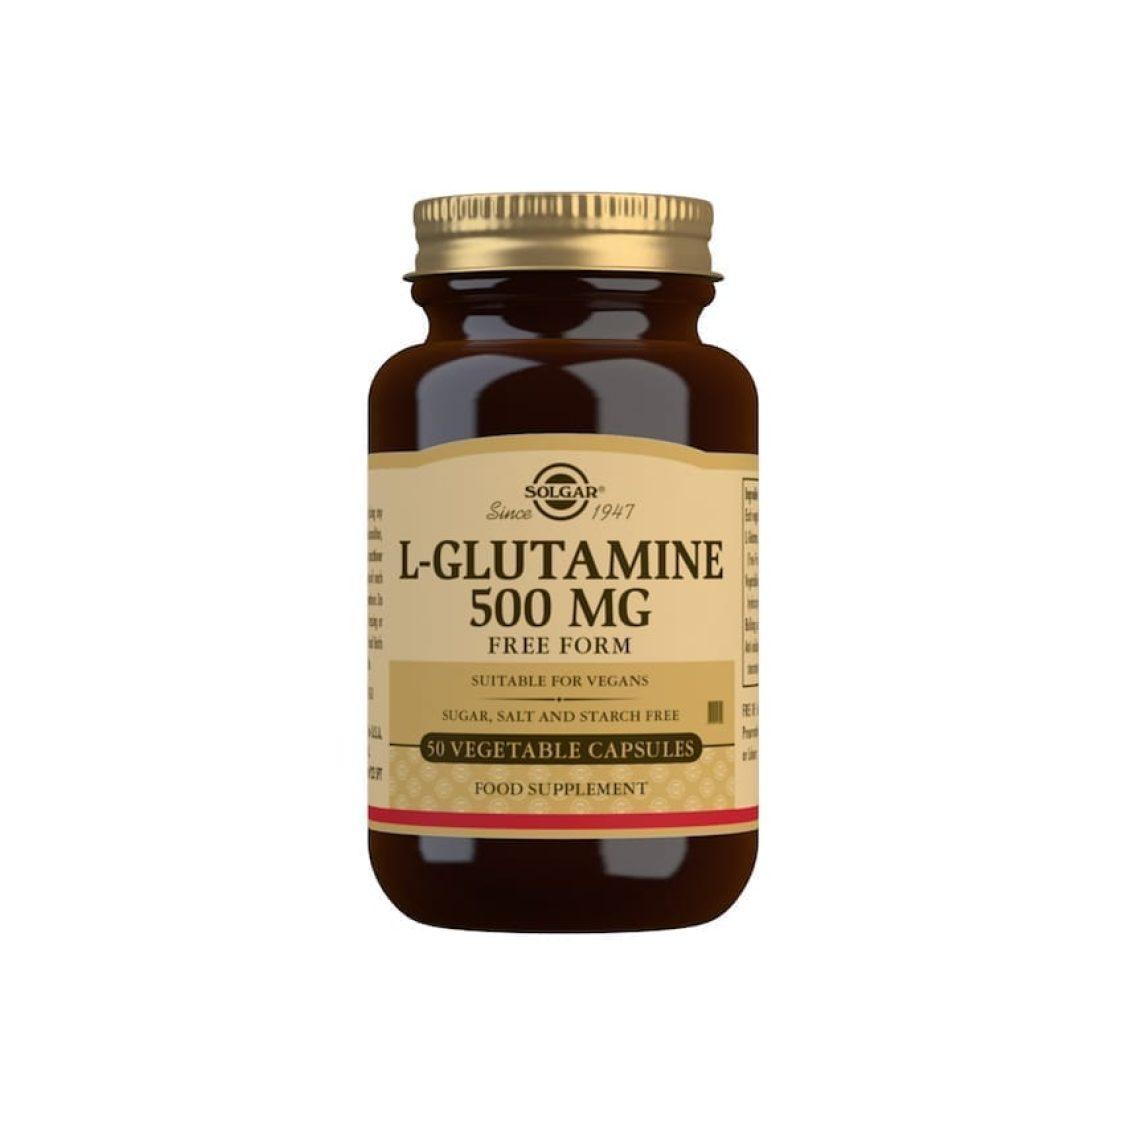 Solgar - Free Form Amino Acids - L-Glutamine 500mg Vegicaps - Size: 50